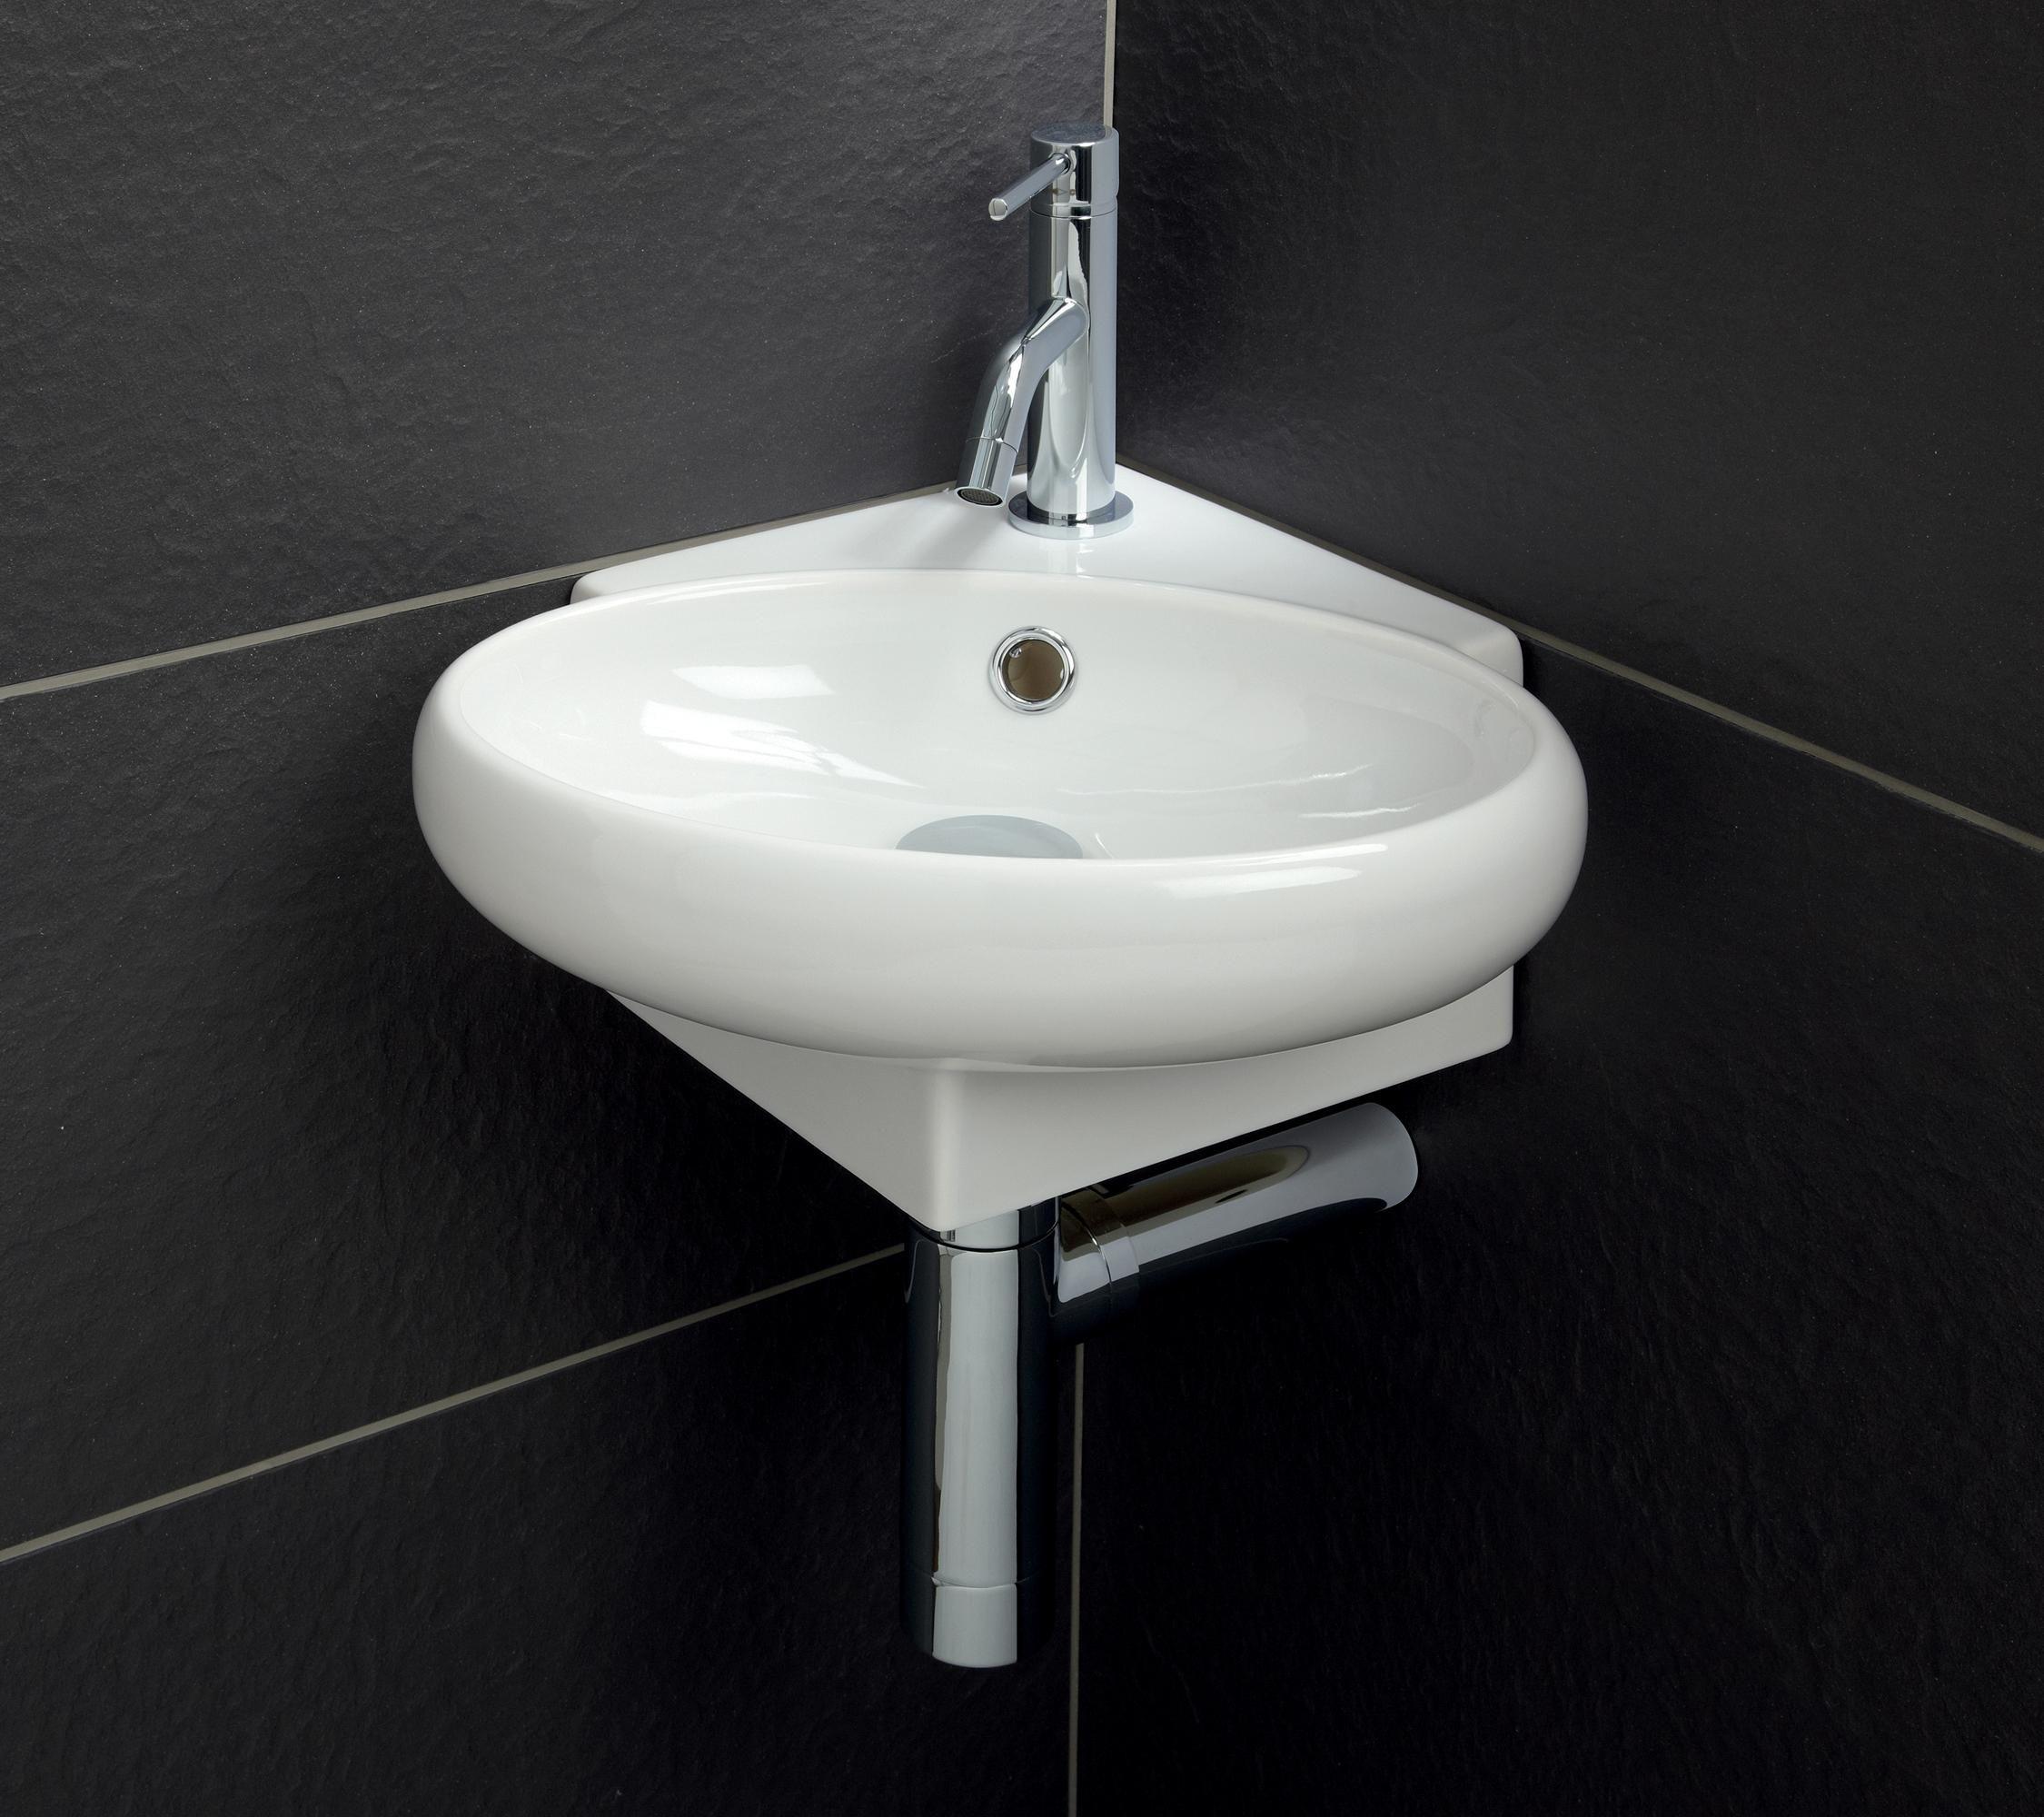 Cloakroom Basins Bella Basin Cloakroom Basin Corner Basin Small Bathroom Inspiration